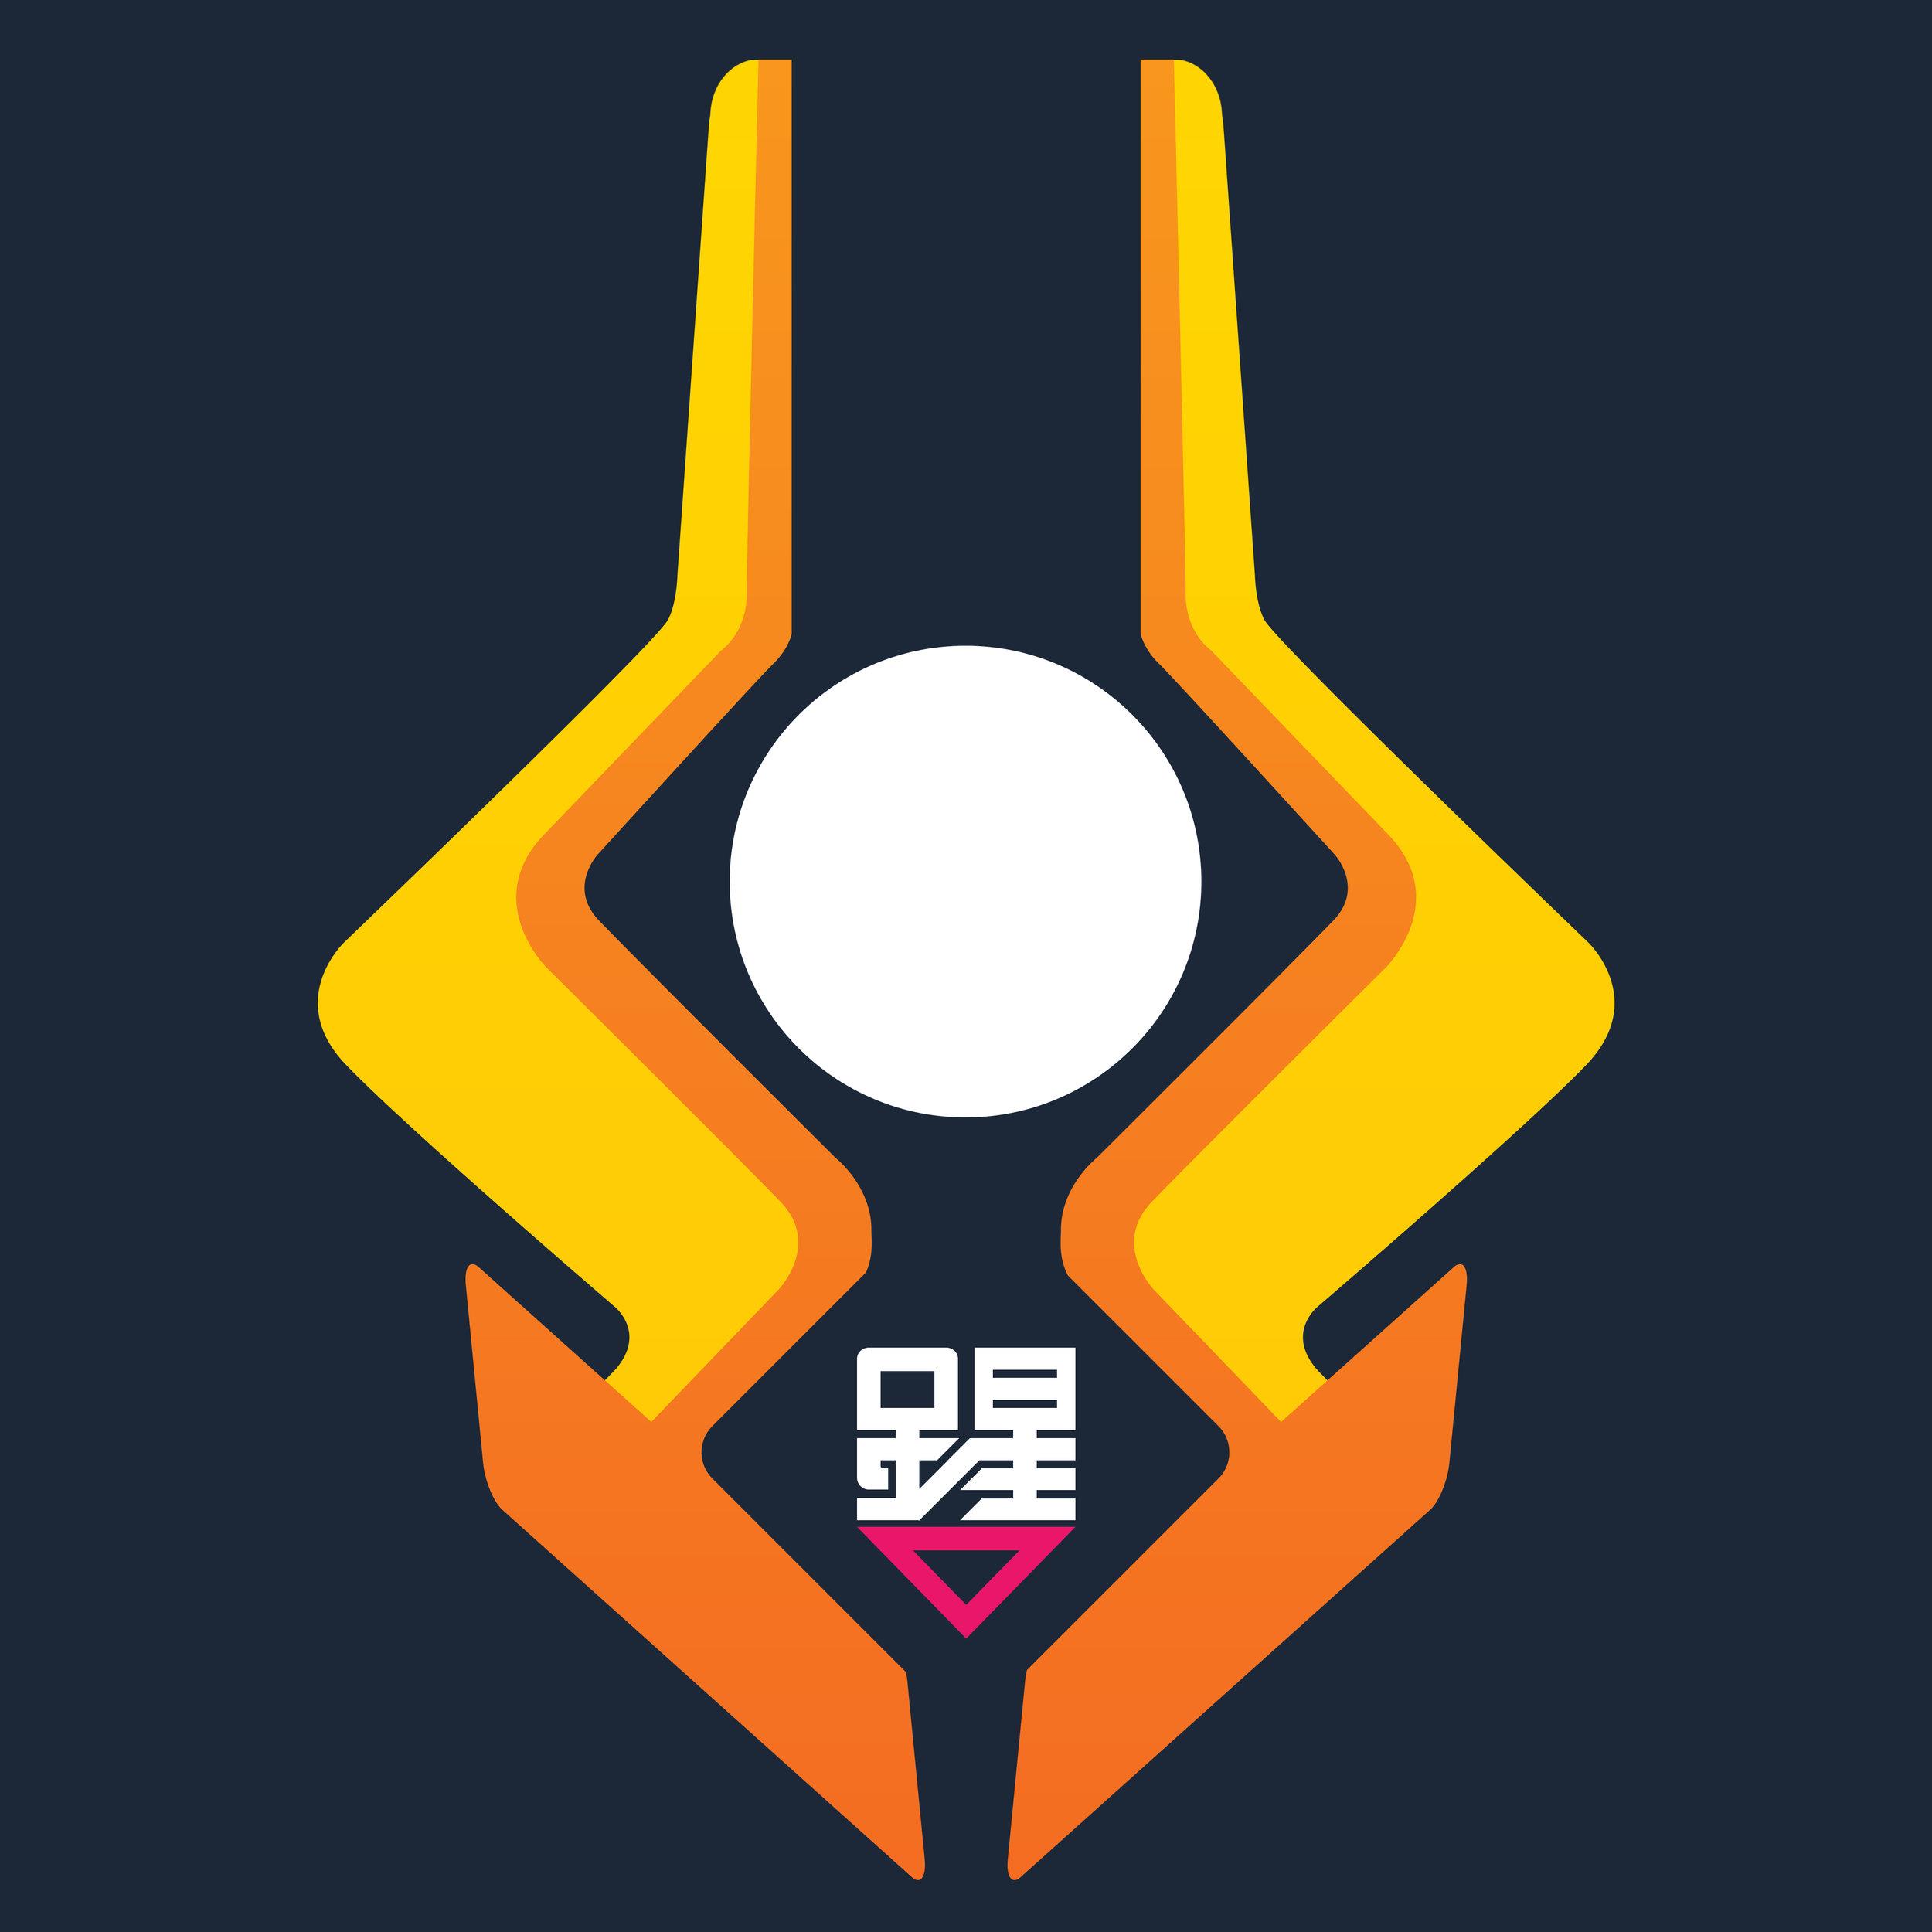 VAN_DCL_Logo_Fa_Enyo.jpg